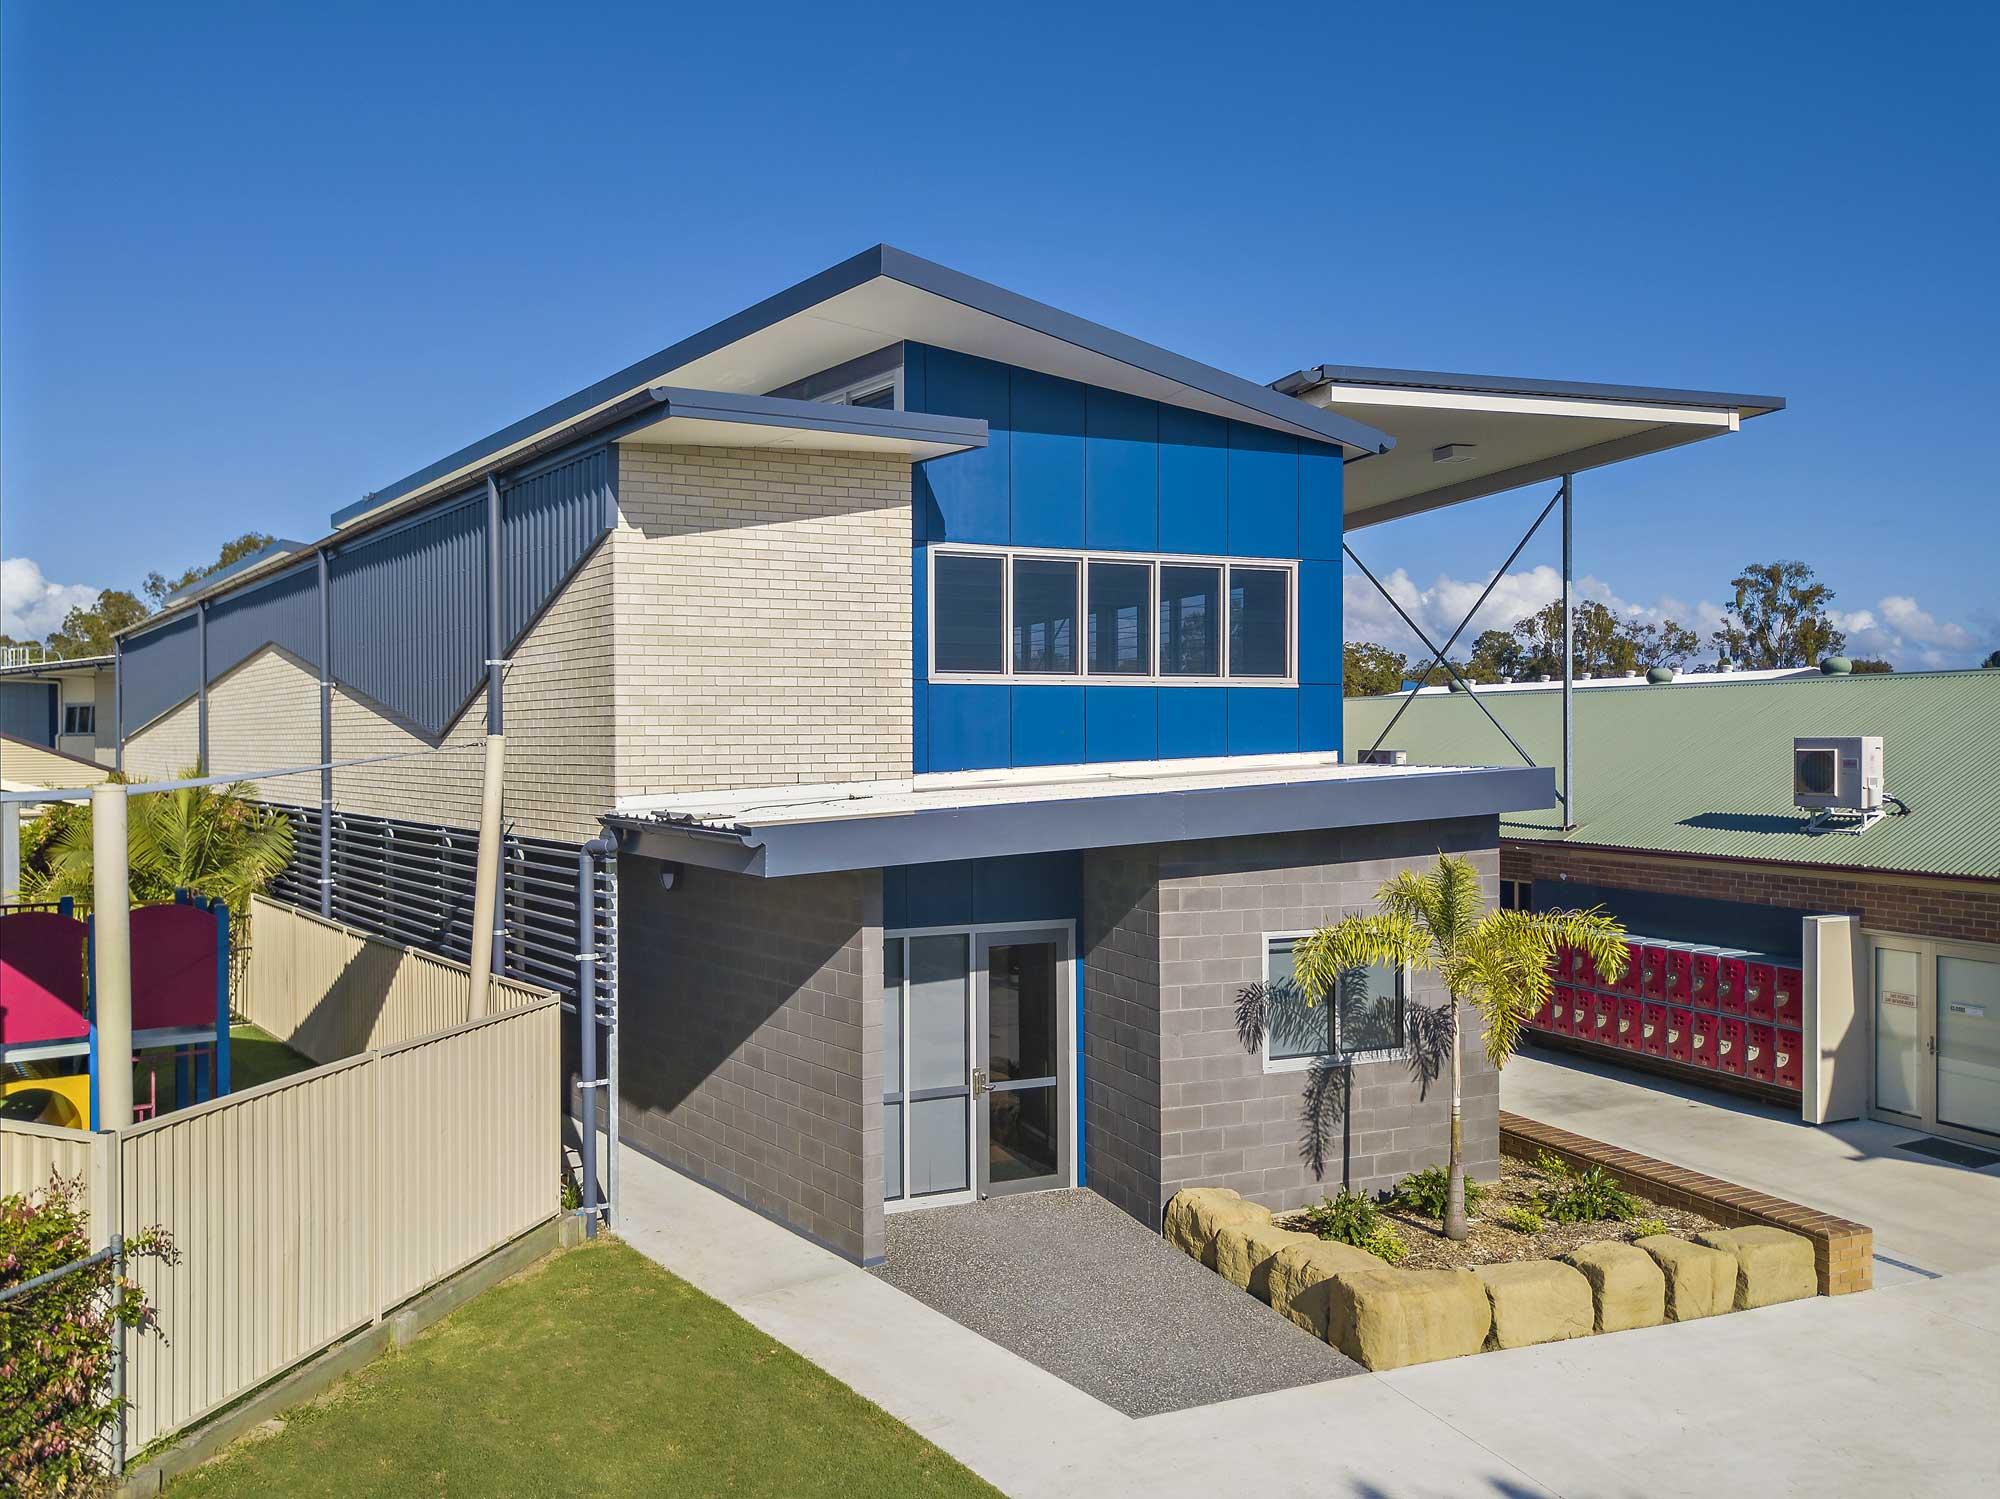 Drone Photography Brisbane - Genesis College school